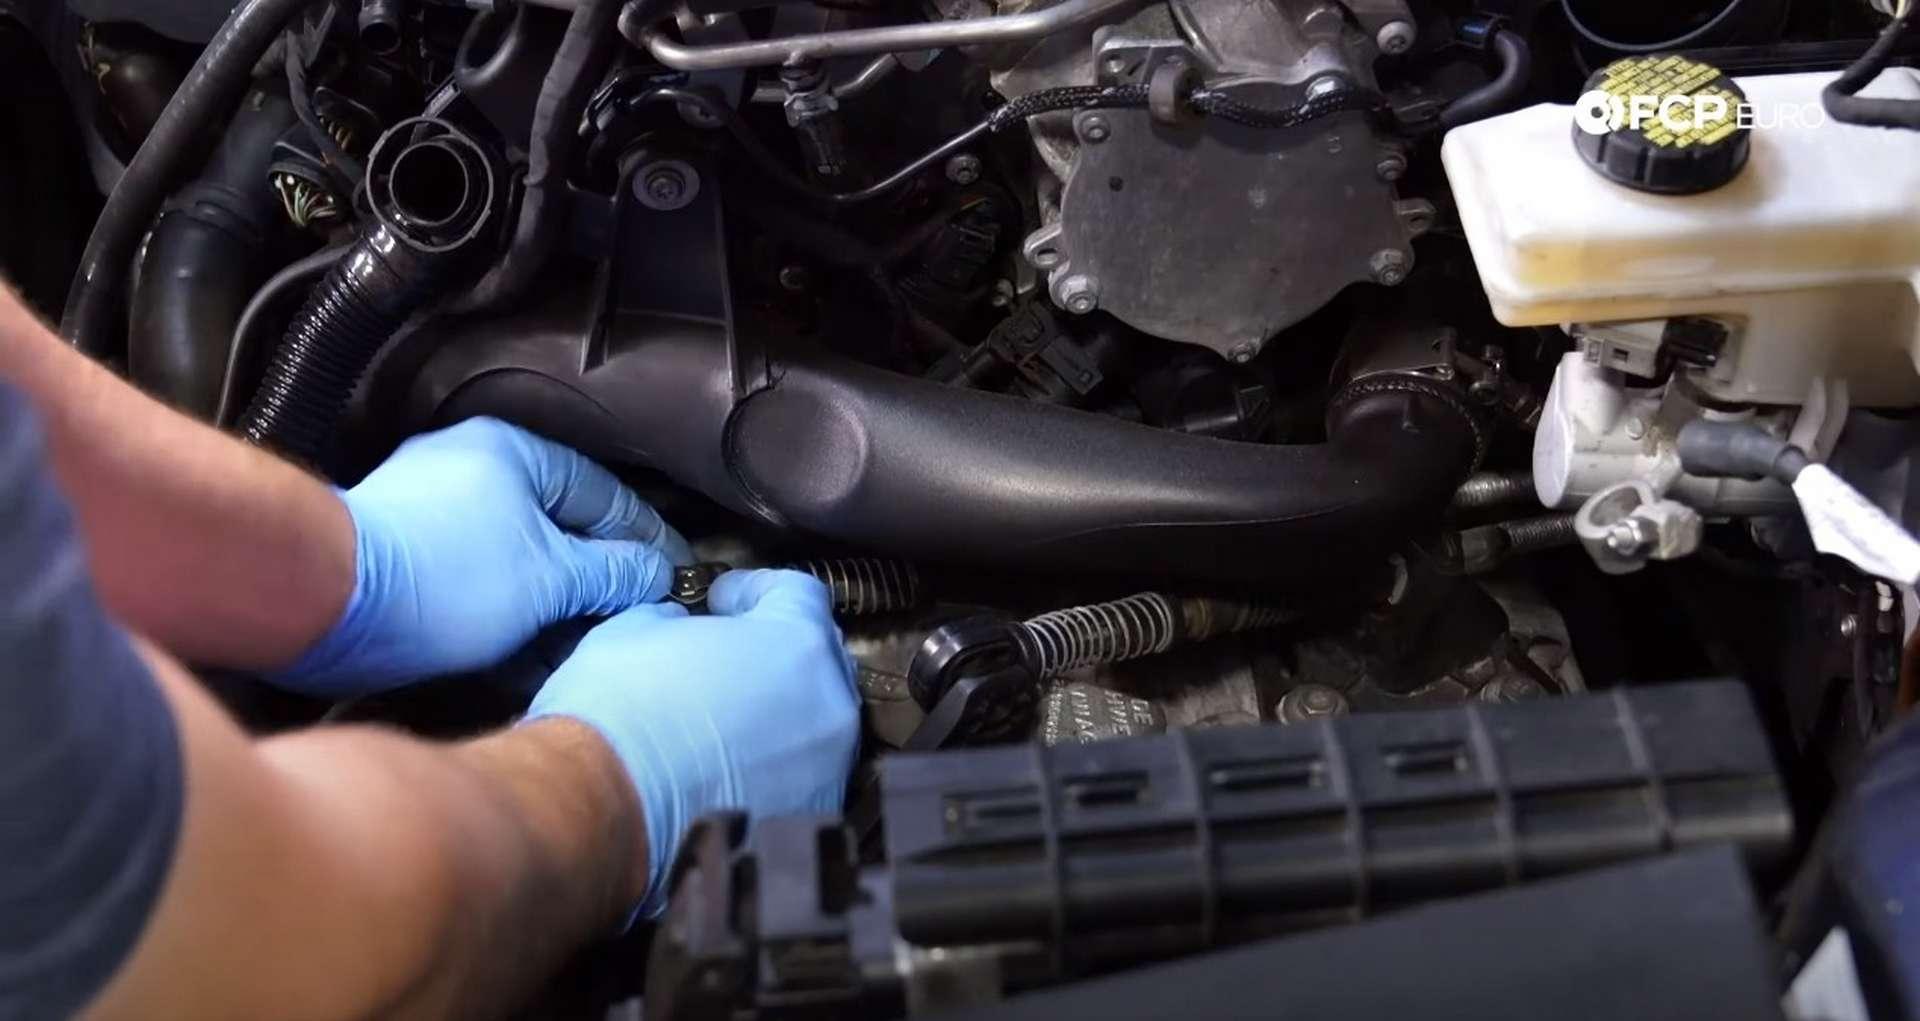 06-DIY_VW_GTI_Clutch-Job-Prepping-Topside-Transmission